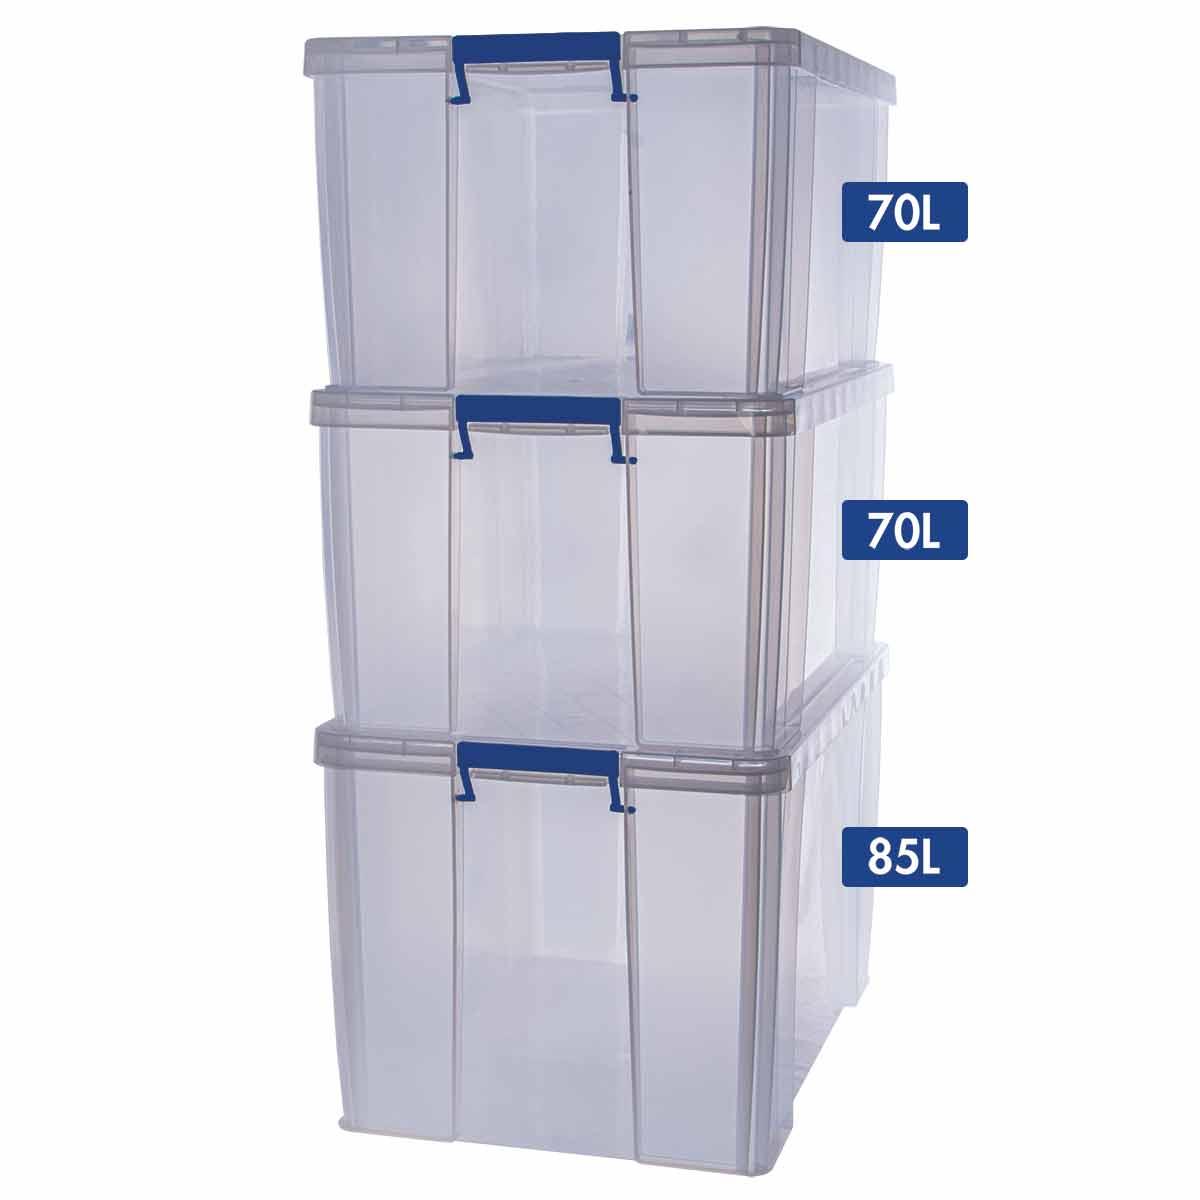 Image of ProStore Storage Box Bonus Pack 2 225L Capacity, Clear